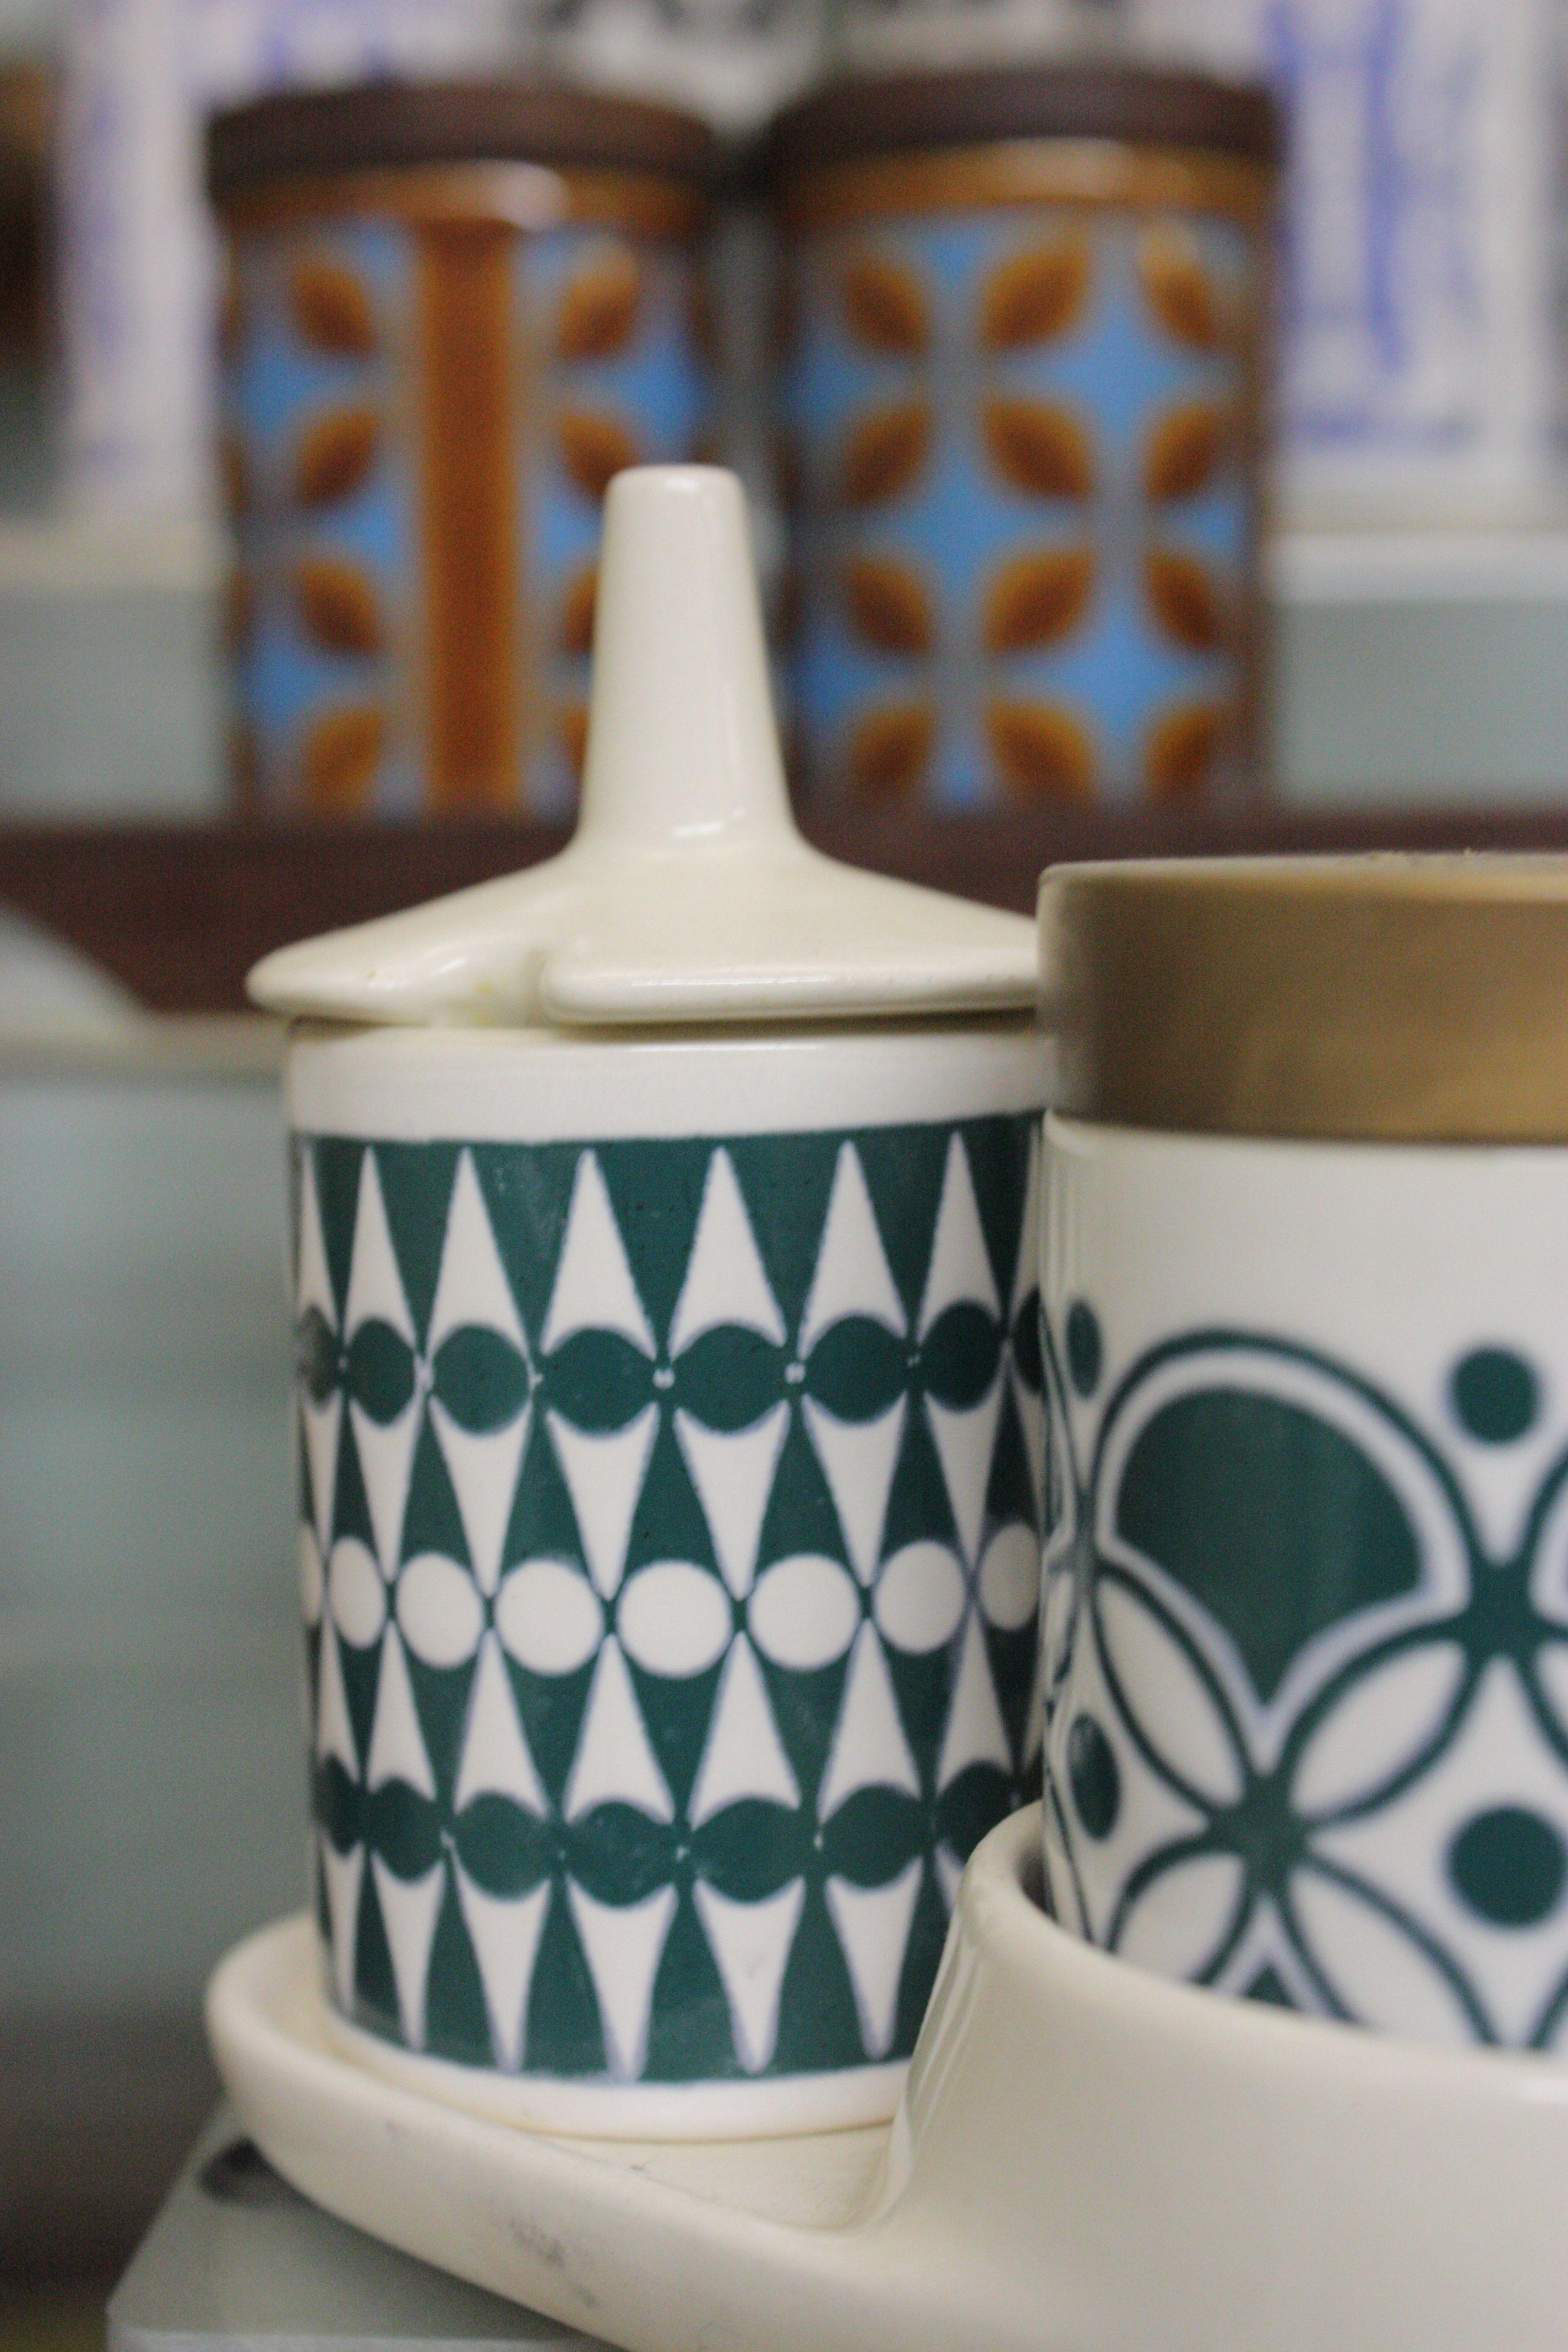 Hornsea Pottery Geometric Cruets At The Hornsea Museum Hornsea Pottery Ceramic Dinnerware Vintage Crockery